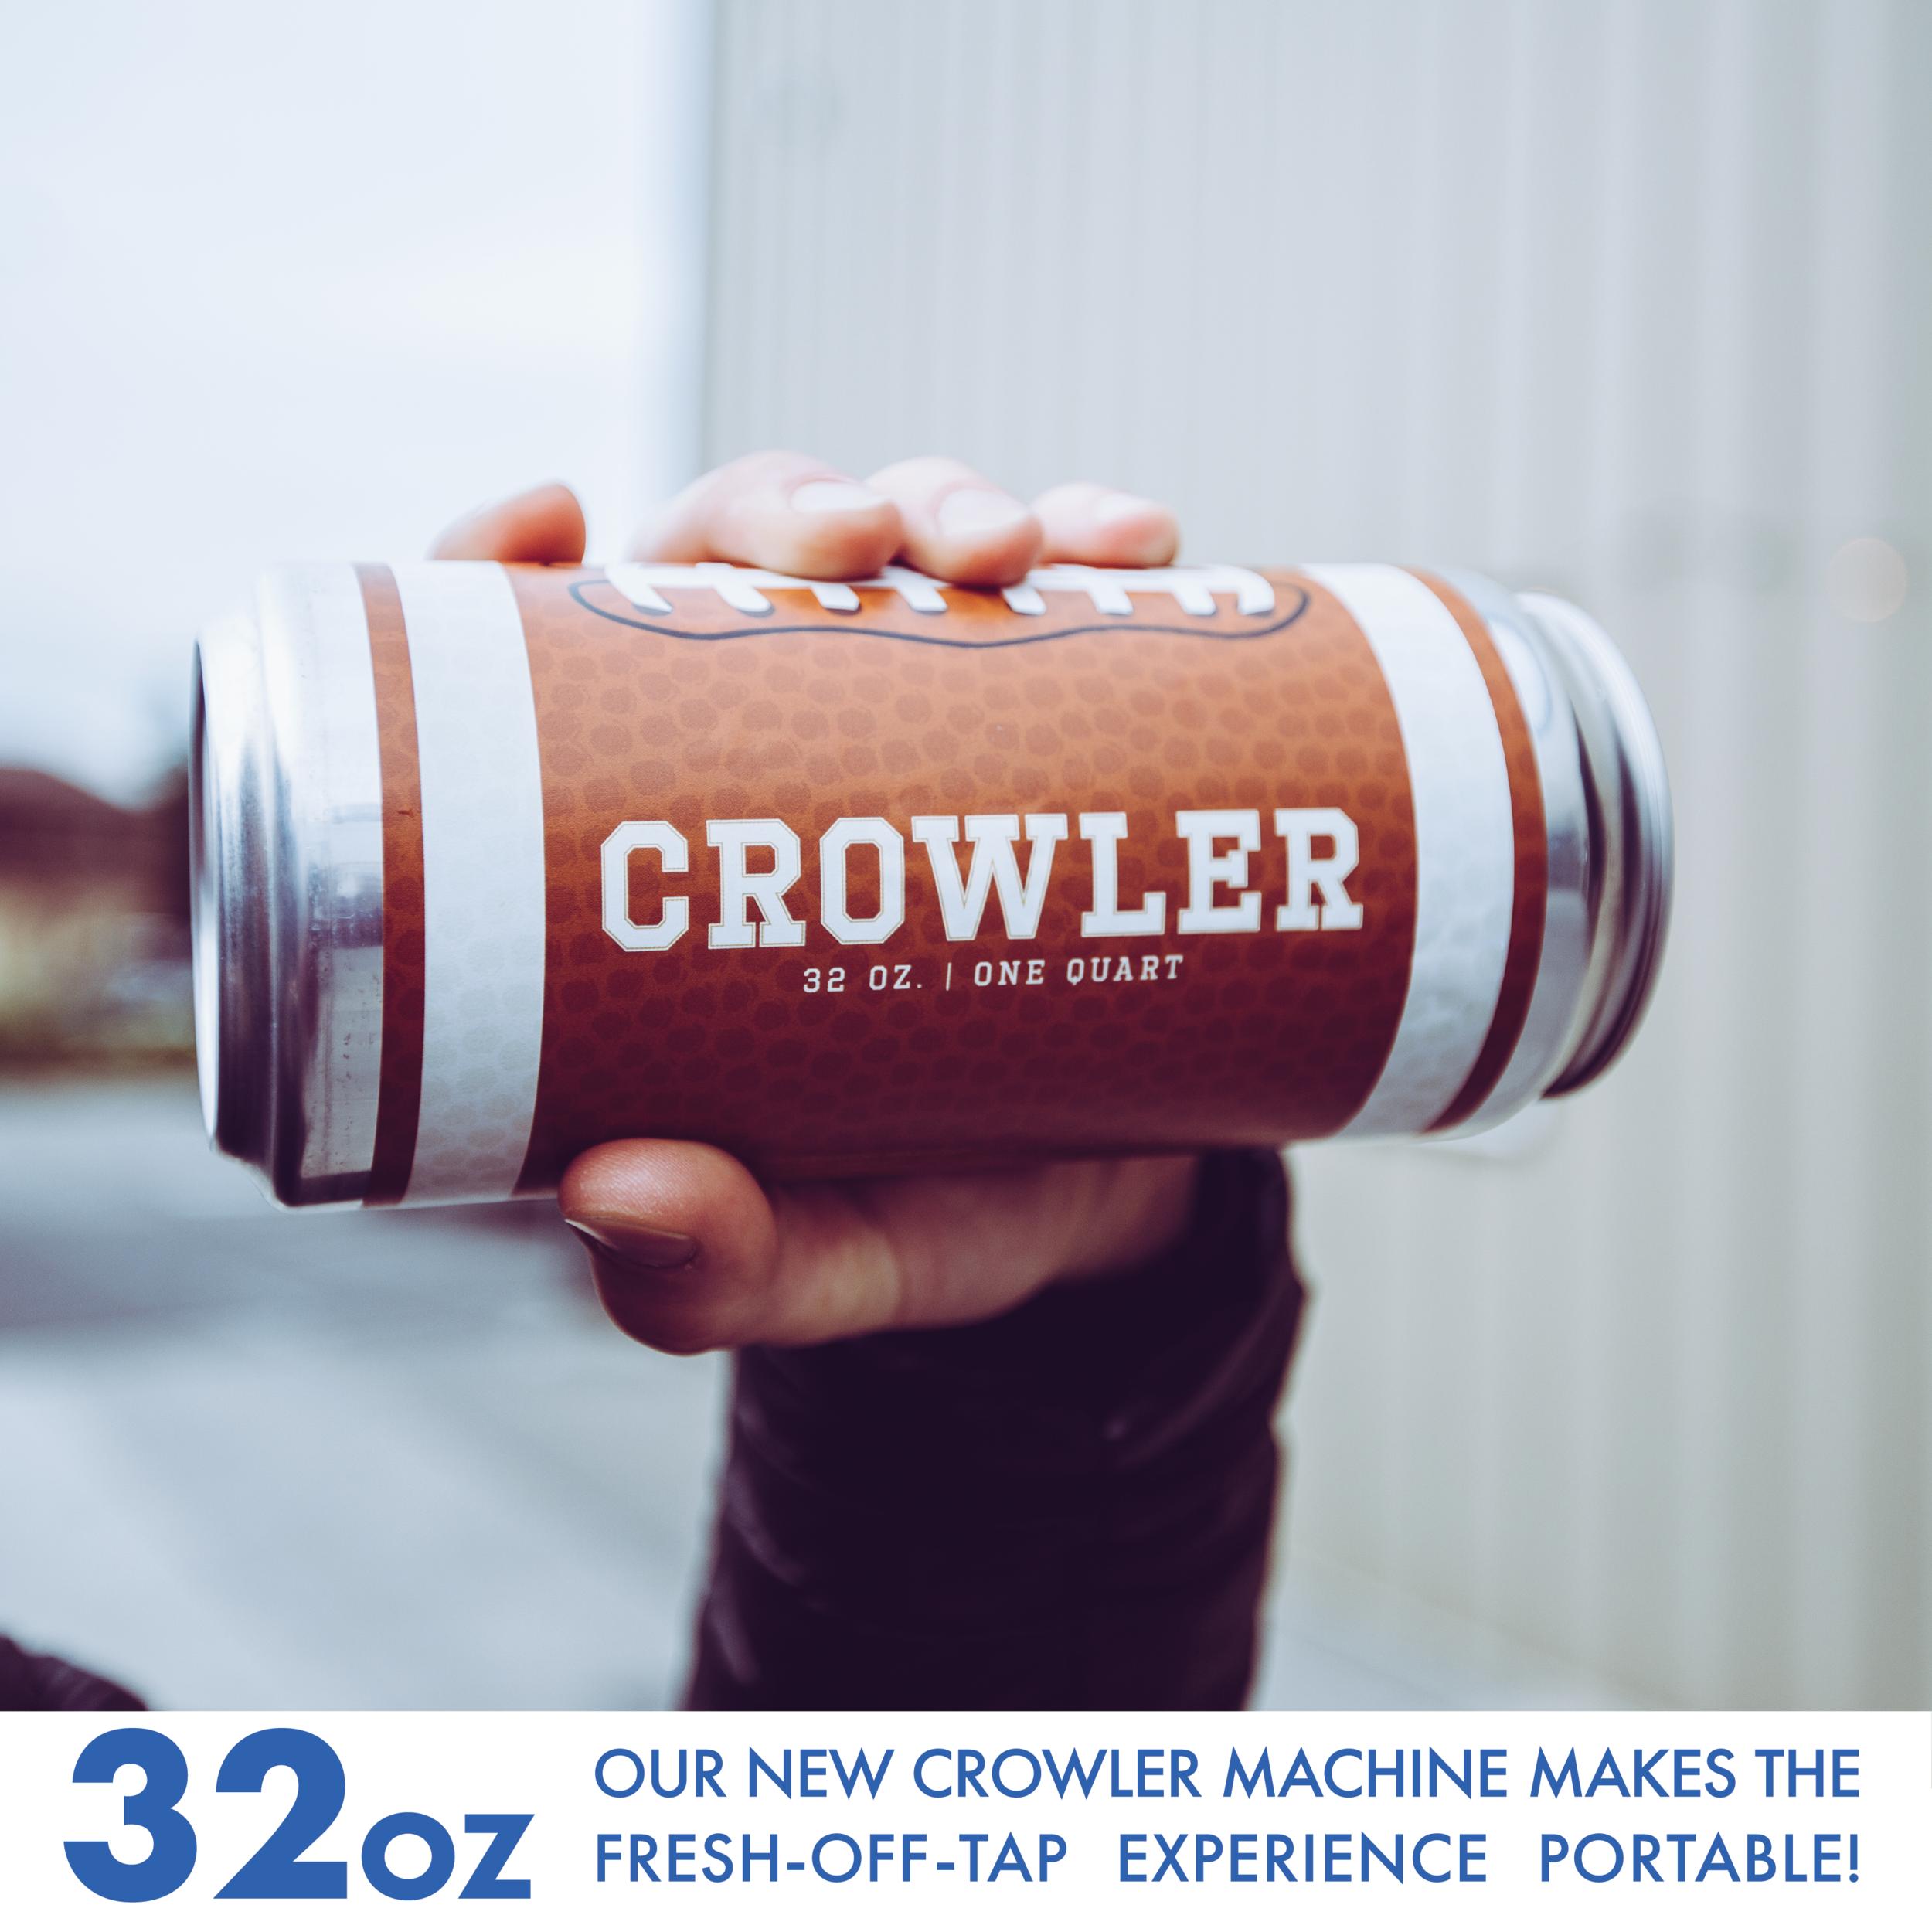 Crowlers